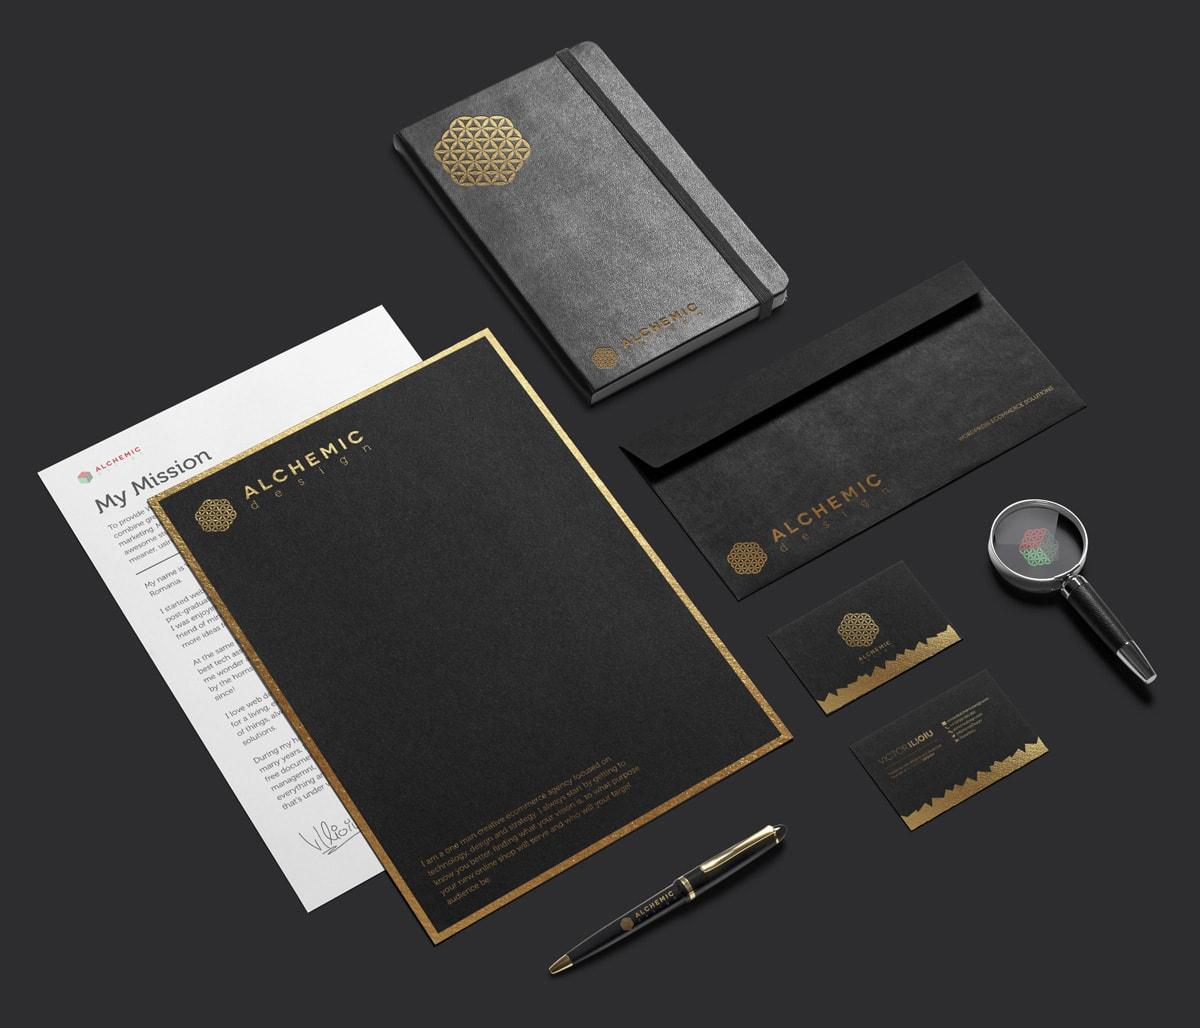 Alchemic Design - the brand